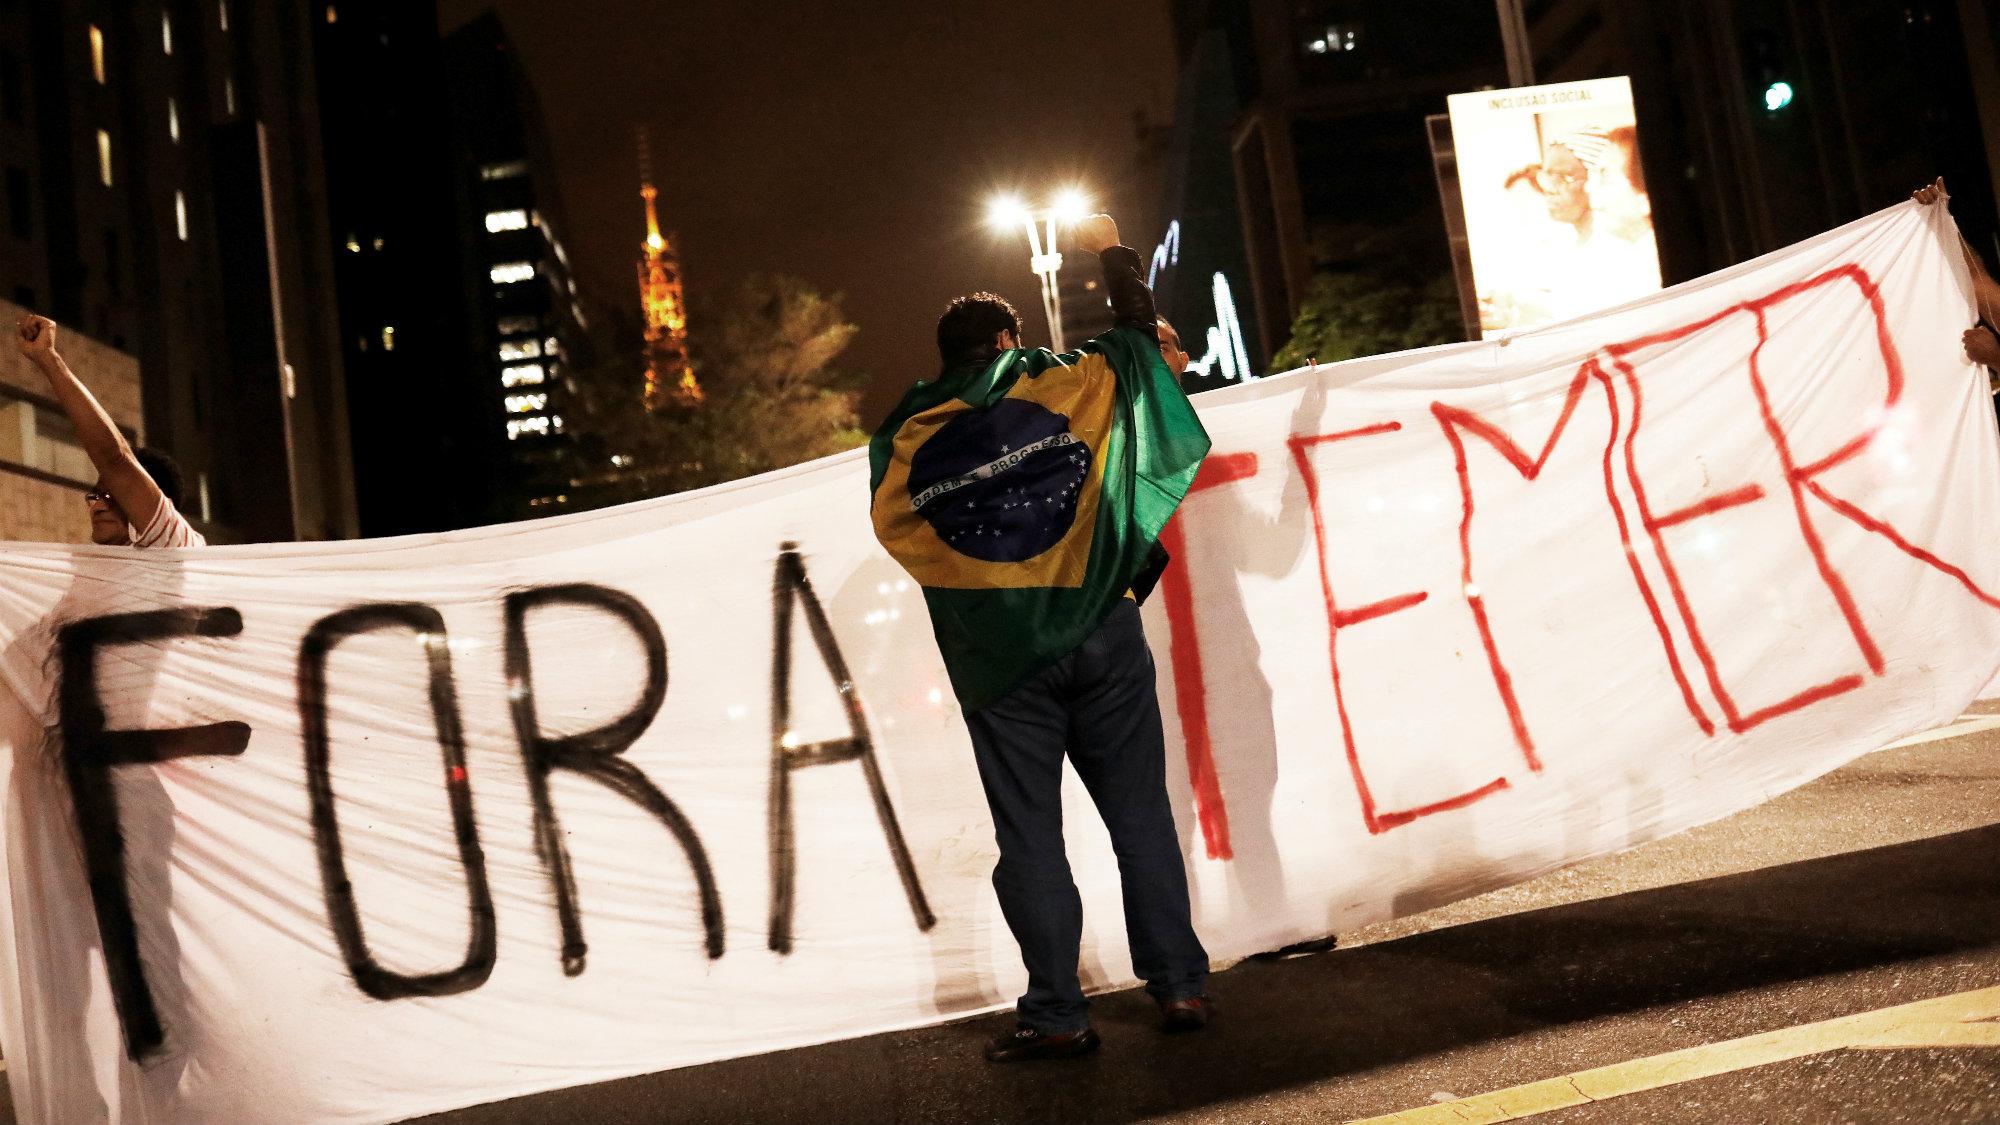 Protests against president Michel Temer in Brazil